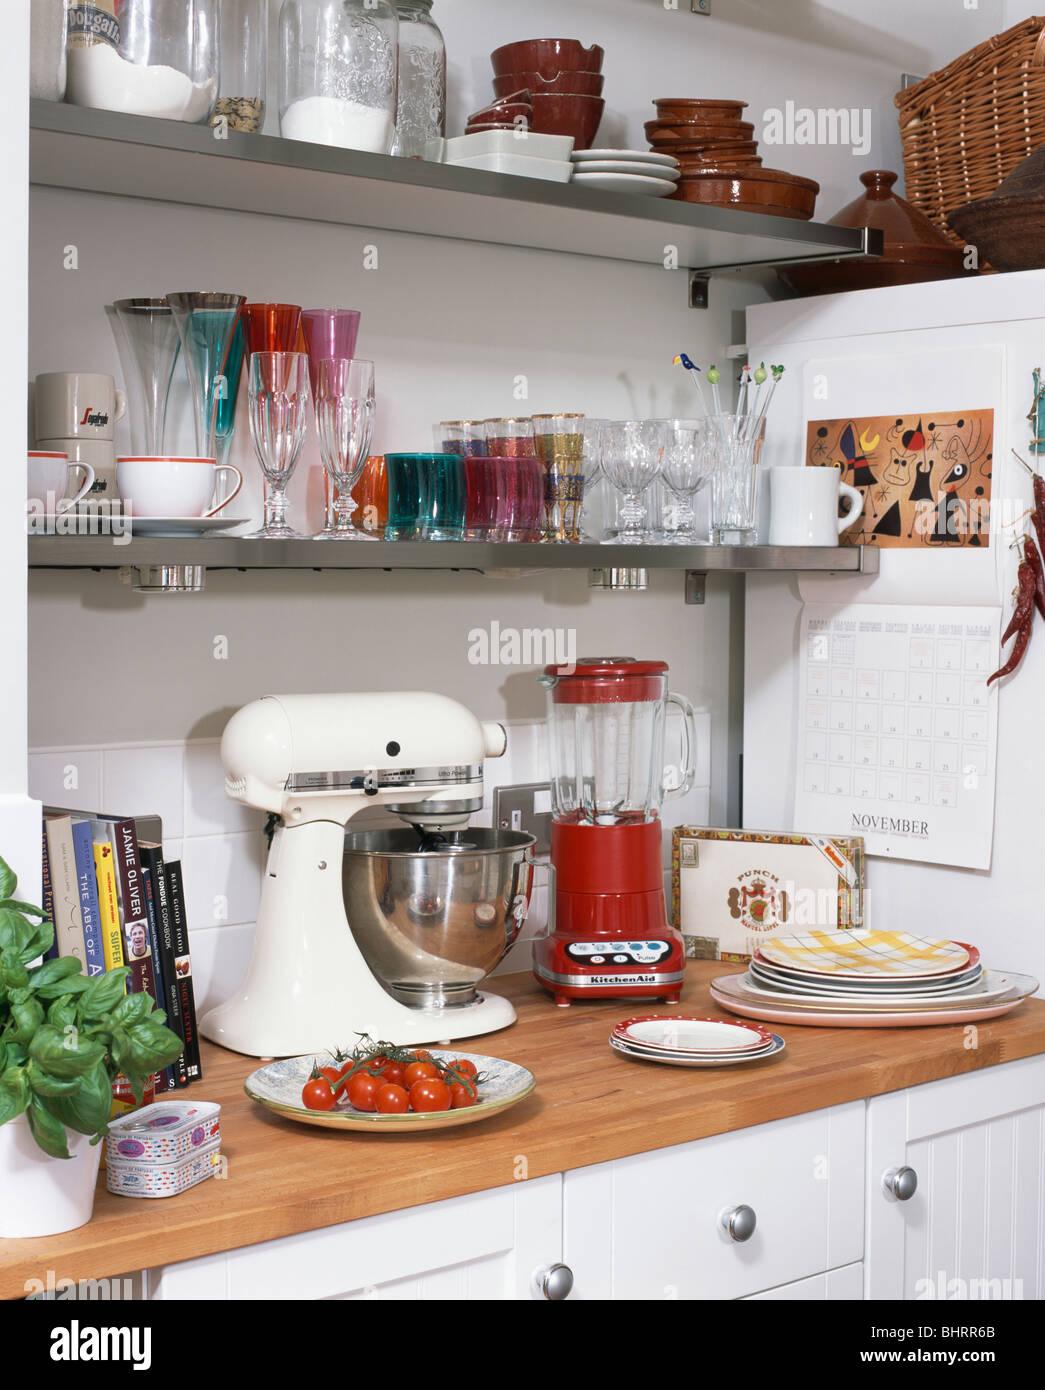 Close Up Of Red Kitchenaid Blender And White Kitchenaid Mixer On Stock Photo Alamy